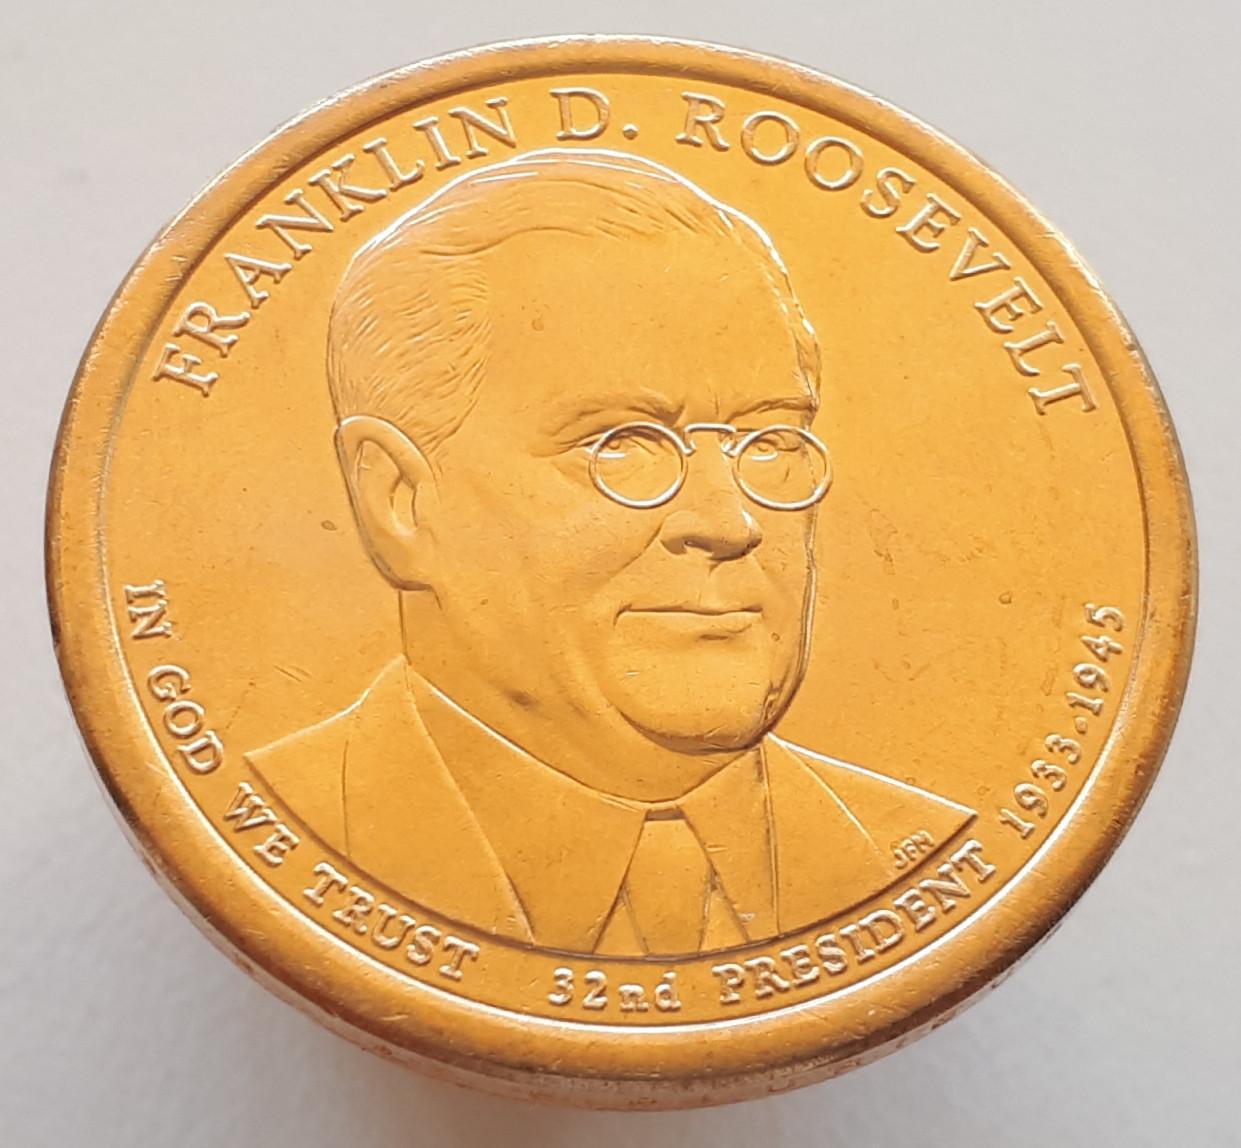 США 1 доллар 2014 - Франклин Рузвельт 32 Президент